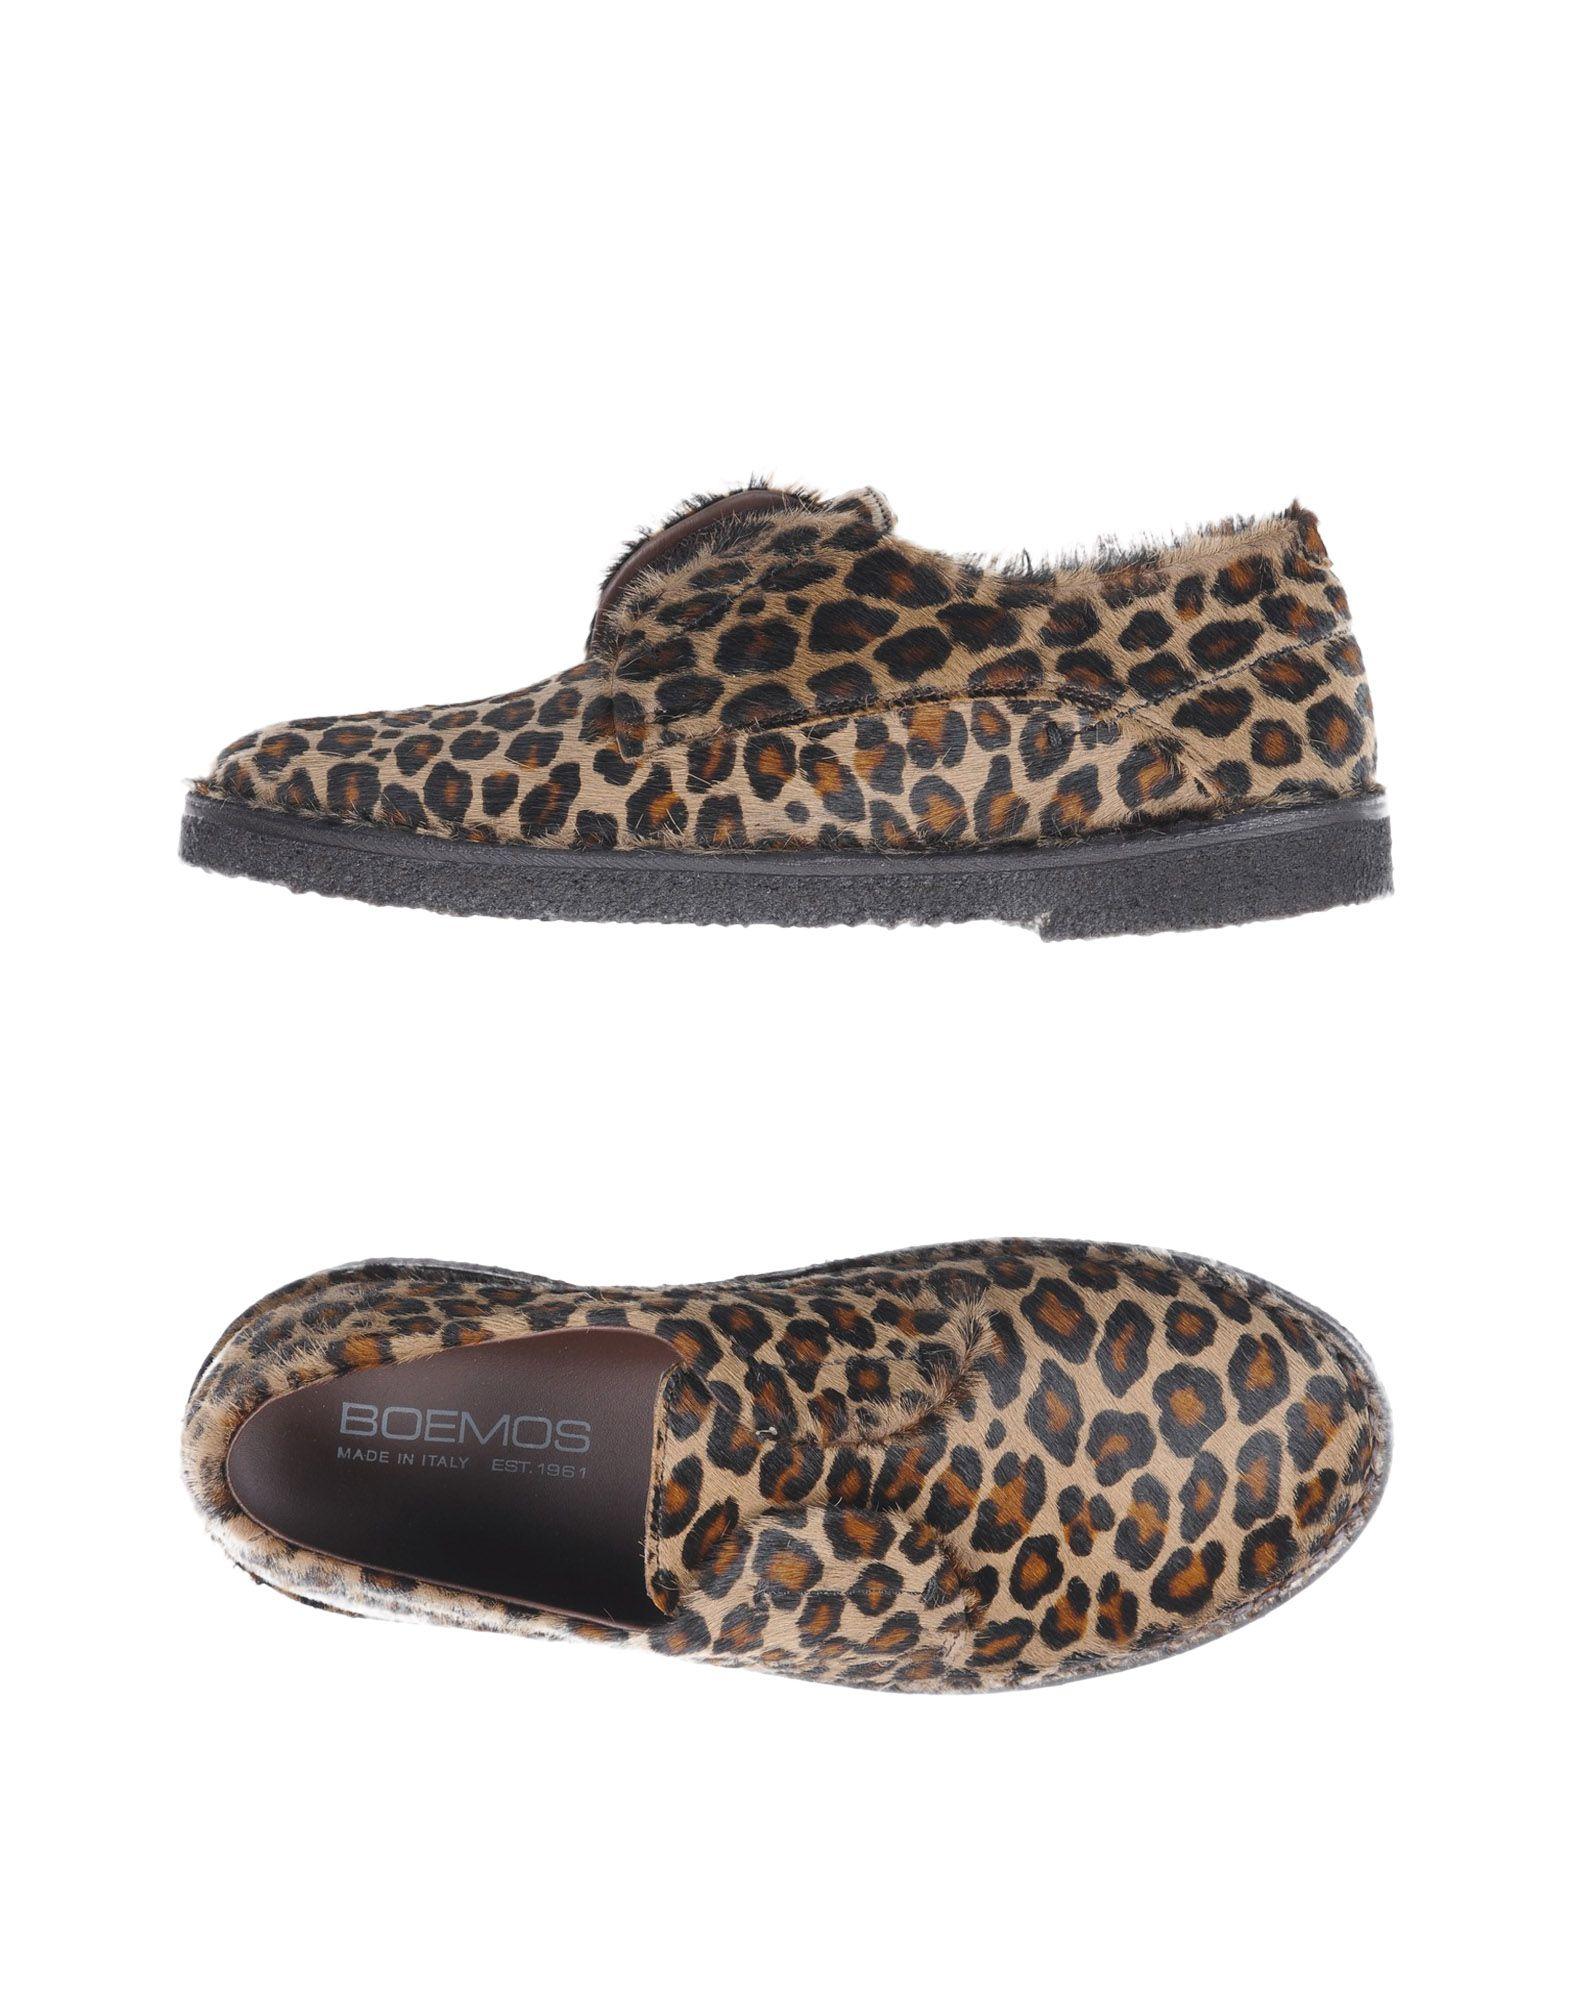 Boemos Mokassins Damen  11350721VI Gute Qualität beliebte Schuhe